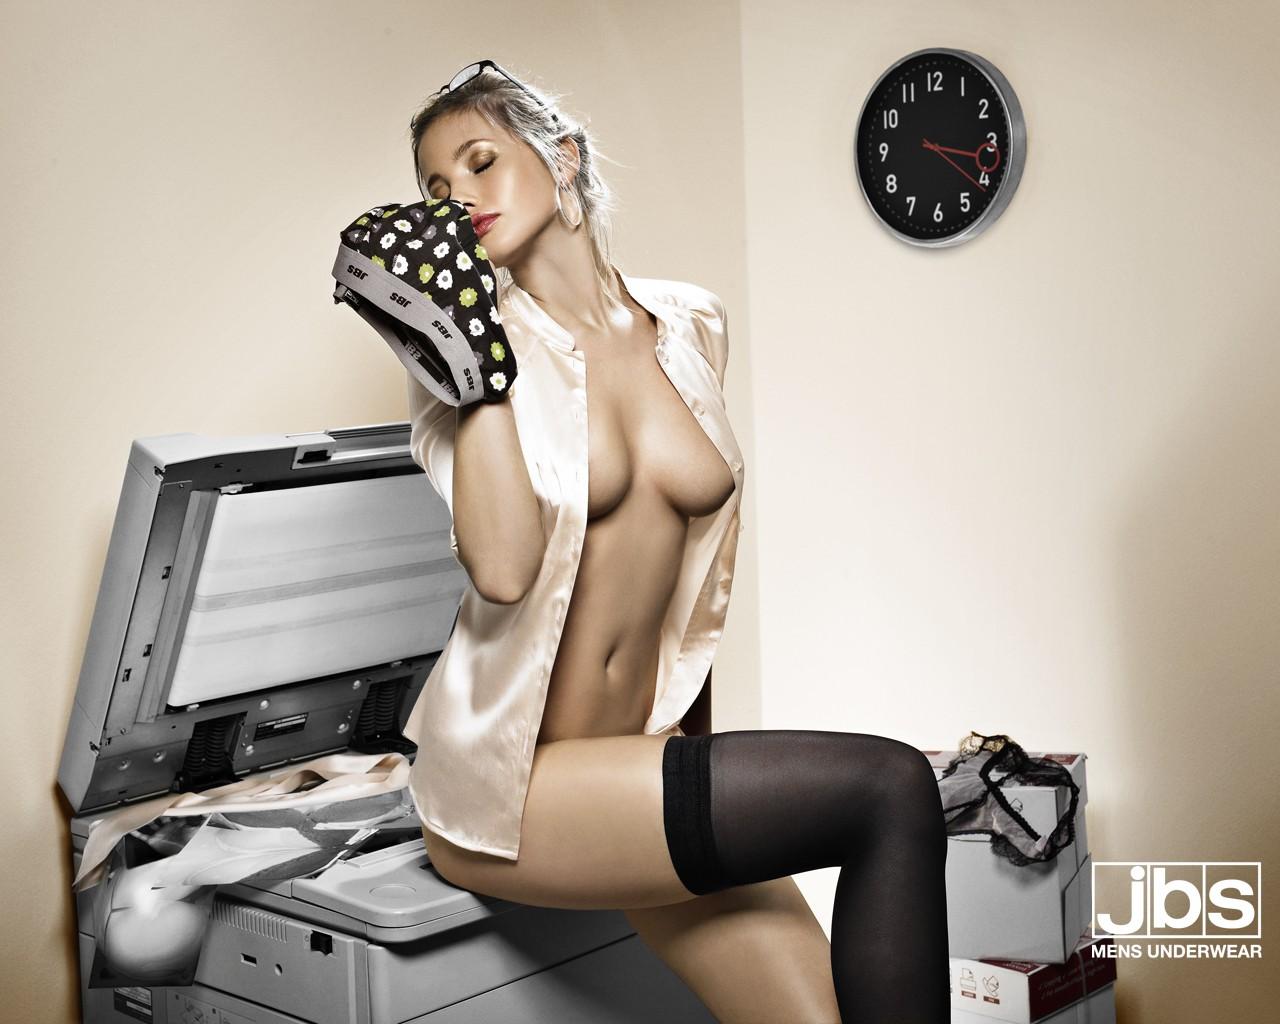 Office naked girls, trinidad anal girls